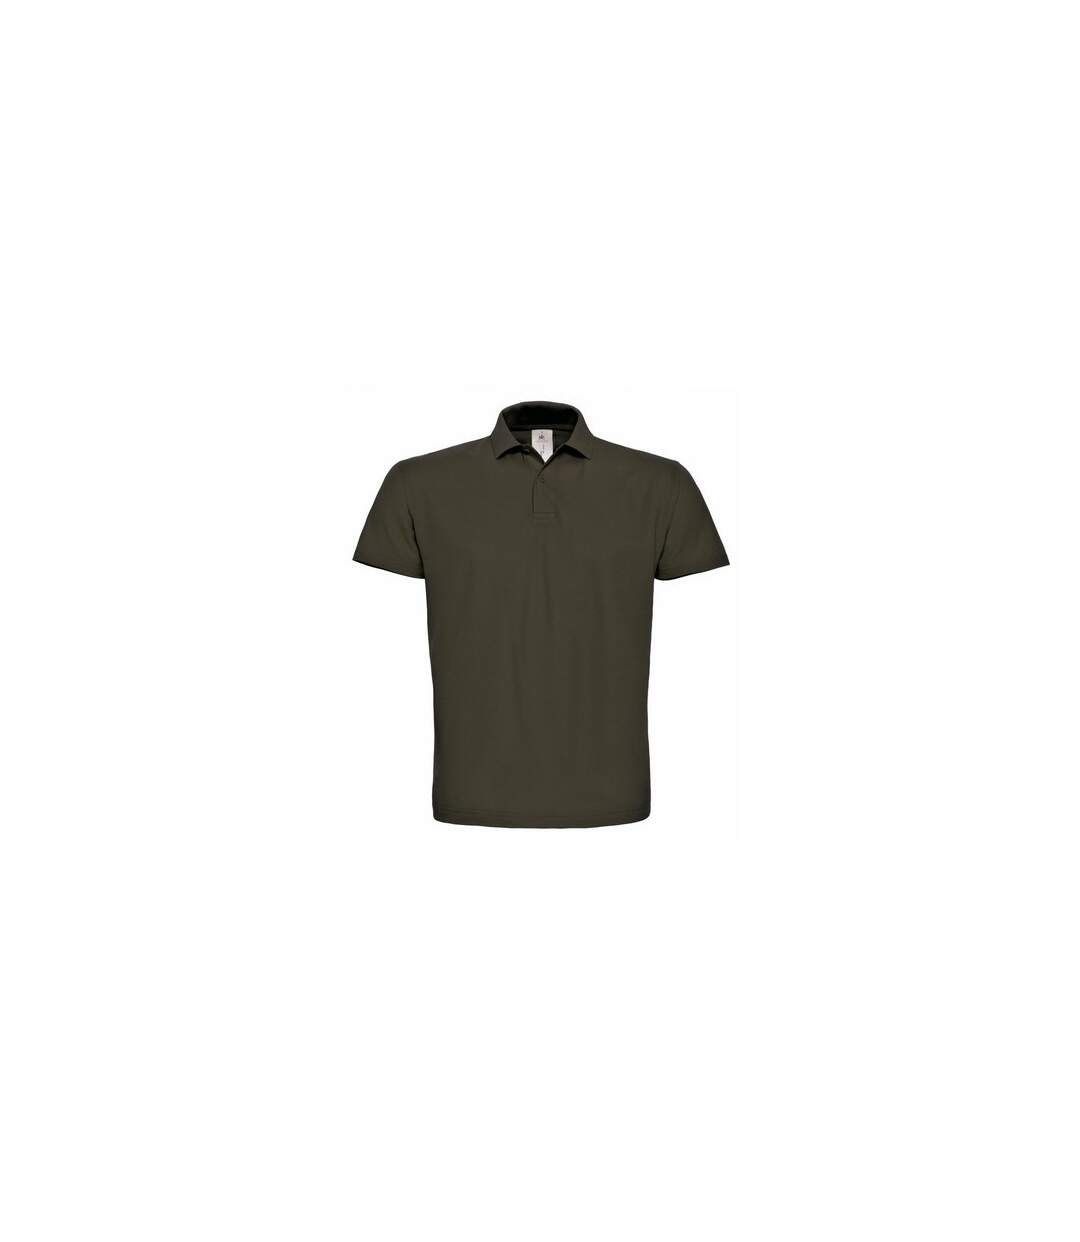 B&C ID.001 Unisex Adults Short Sleeve Polo Shirt (Brown) - UTBC1285